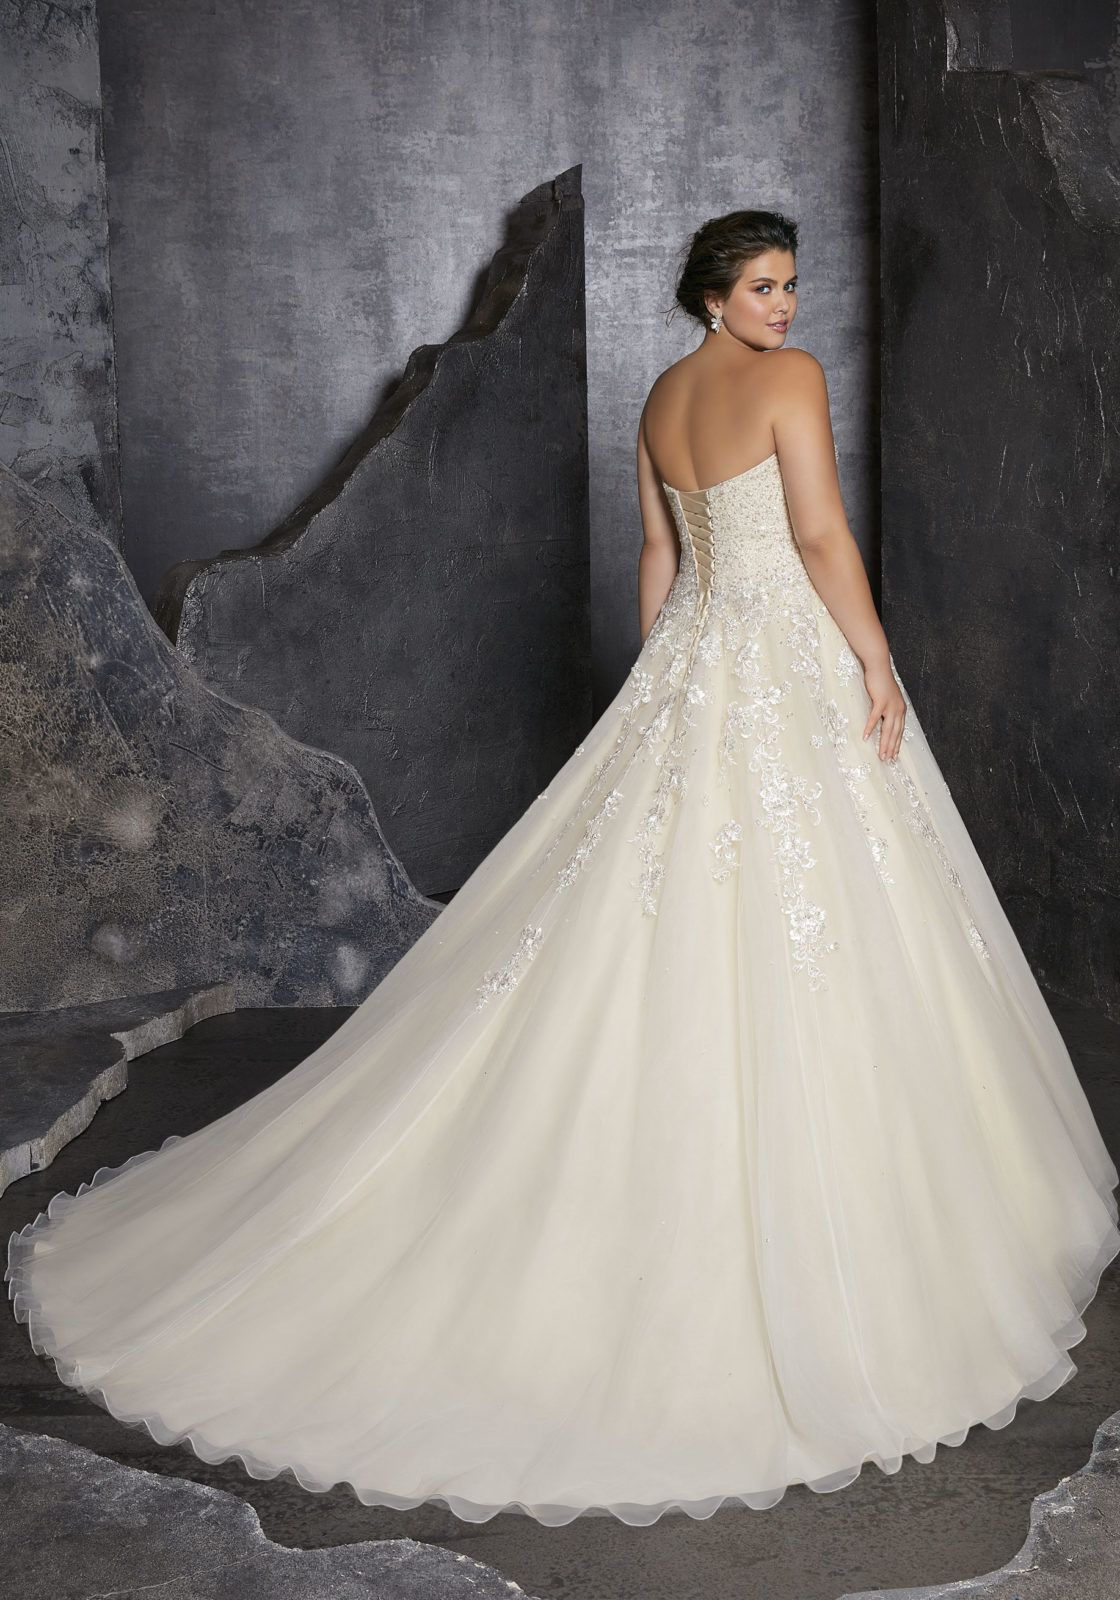 Kasmira wedding dress morilee by madeline gardner pinterest